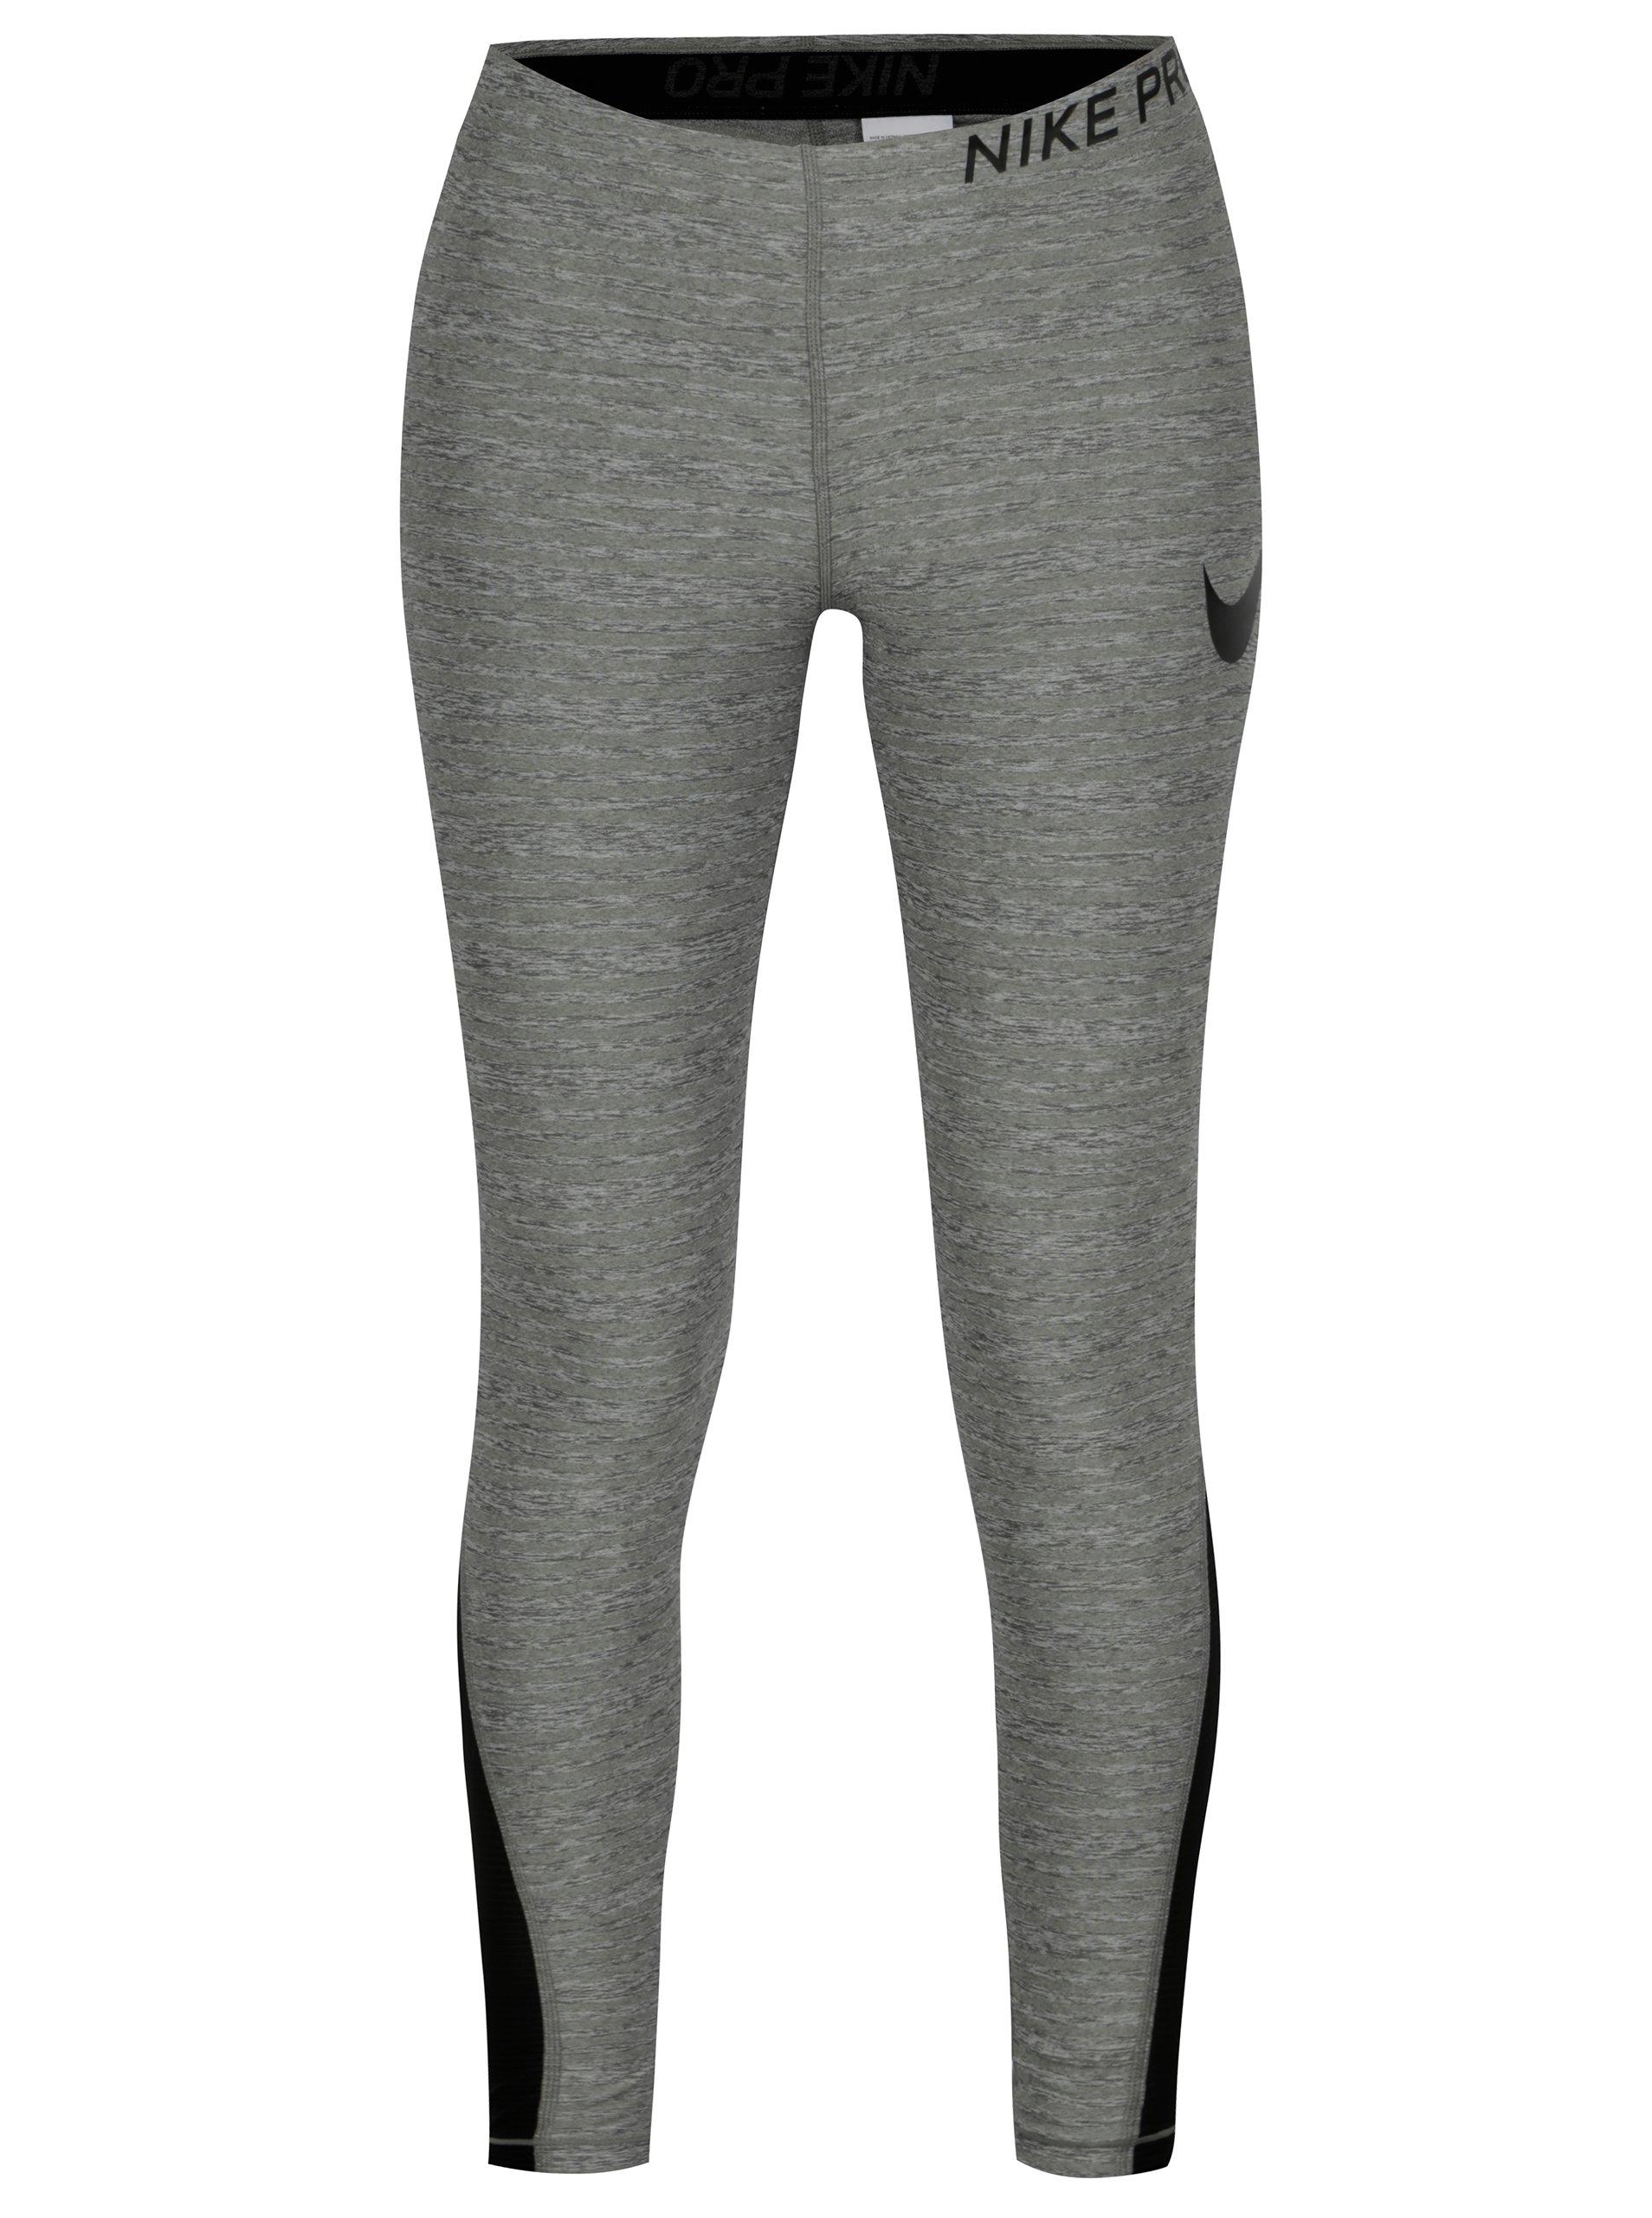 a714332e1eec Sivé melírované dámske funkčné legíny Nike Training Tights